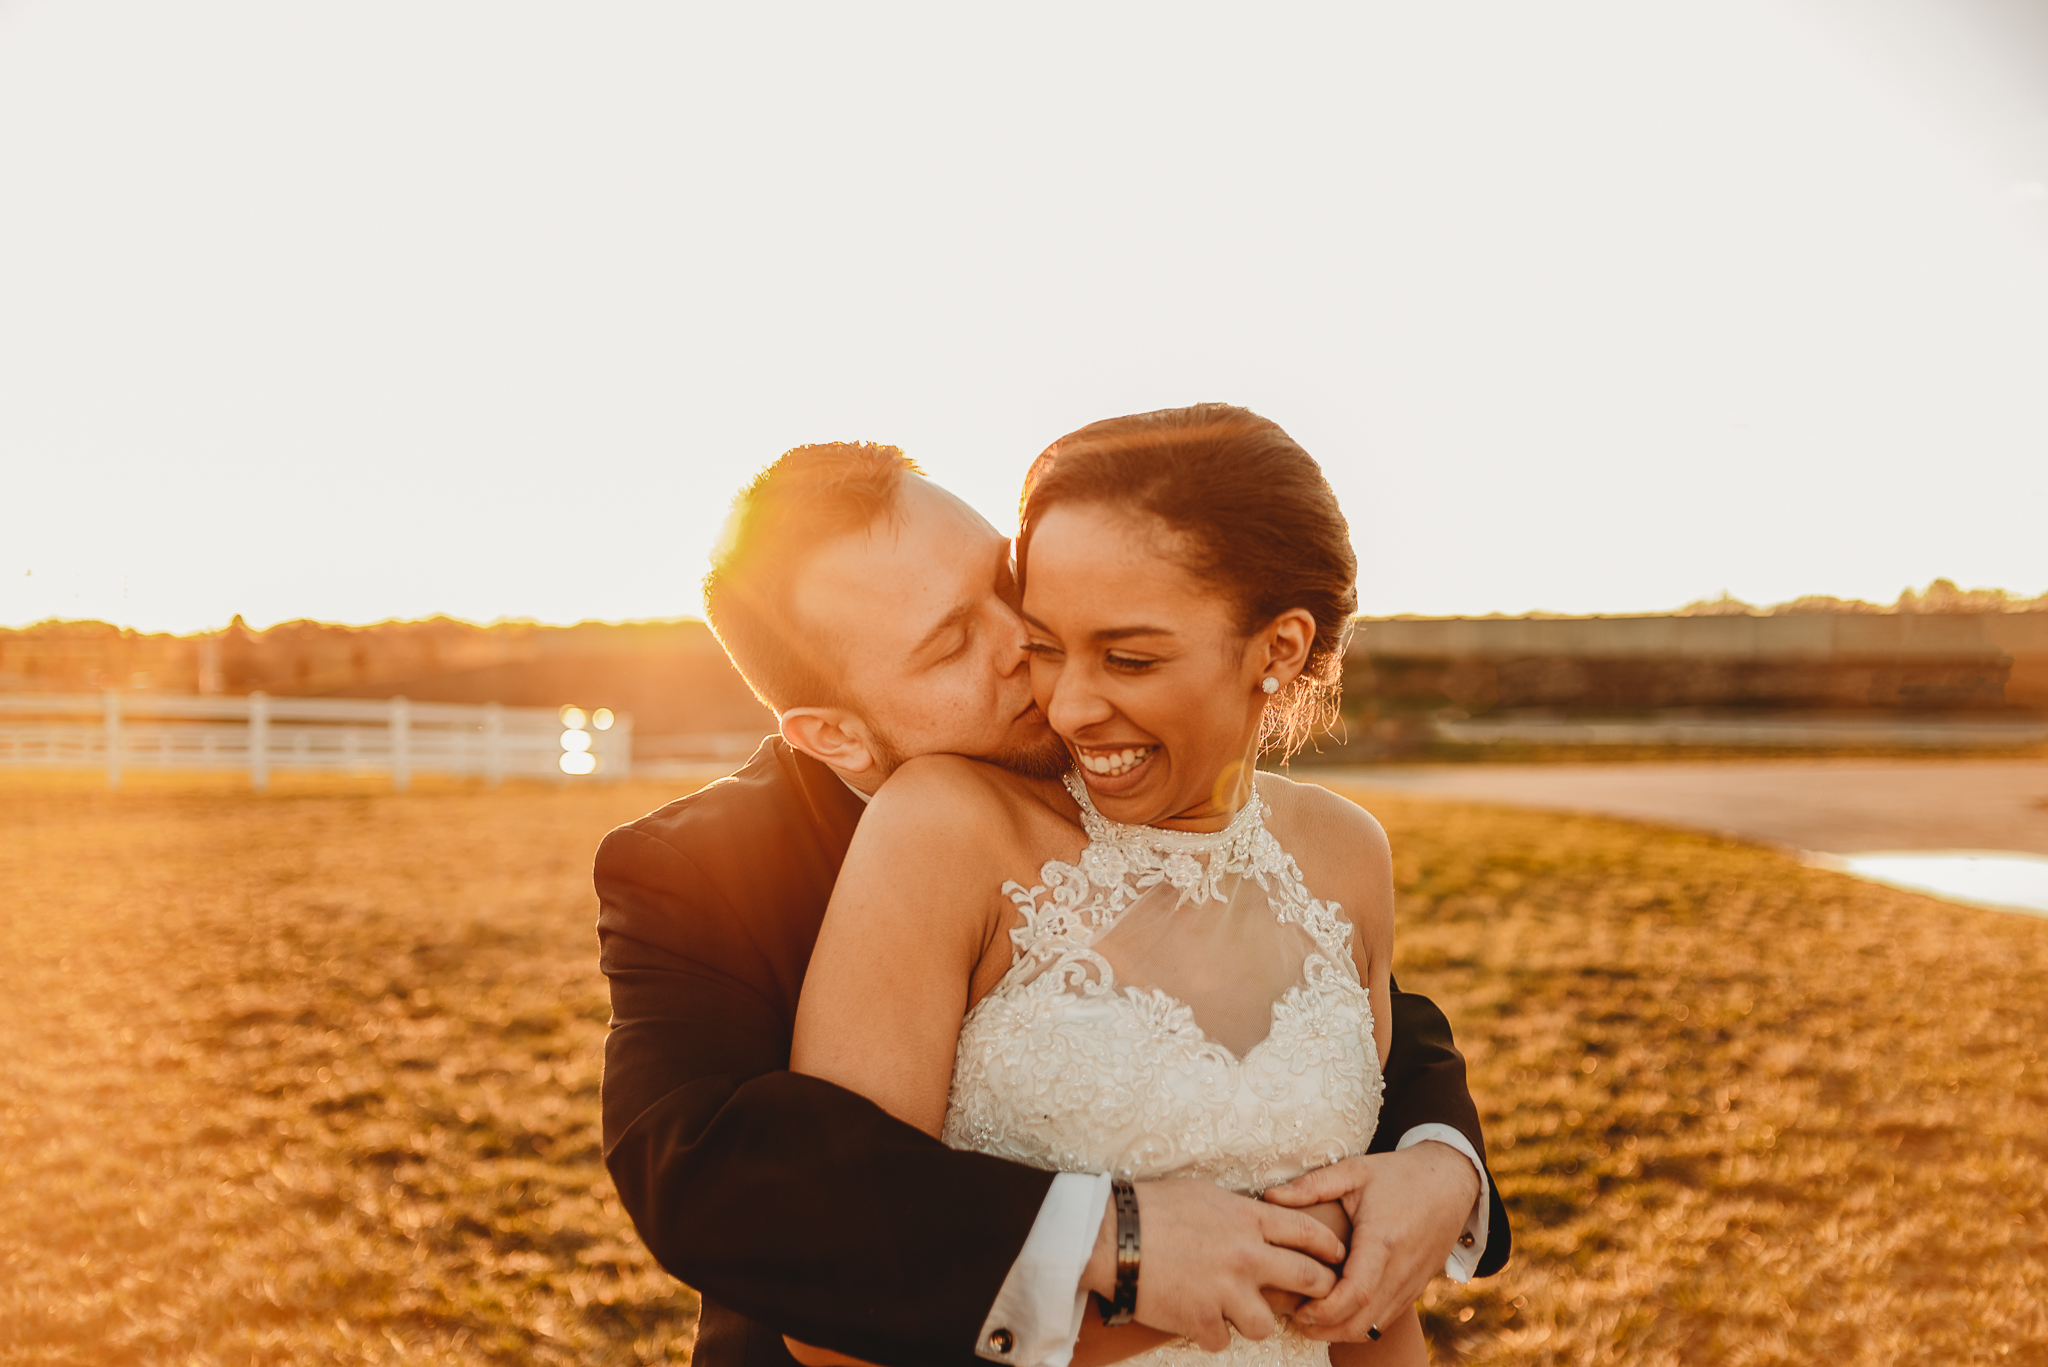 Kamren+Trever_Mildale Farm Wedding_Treolo Photography_WEB311.jpg